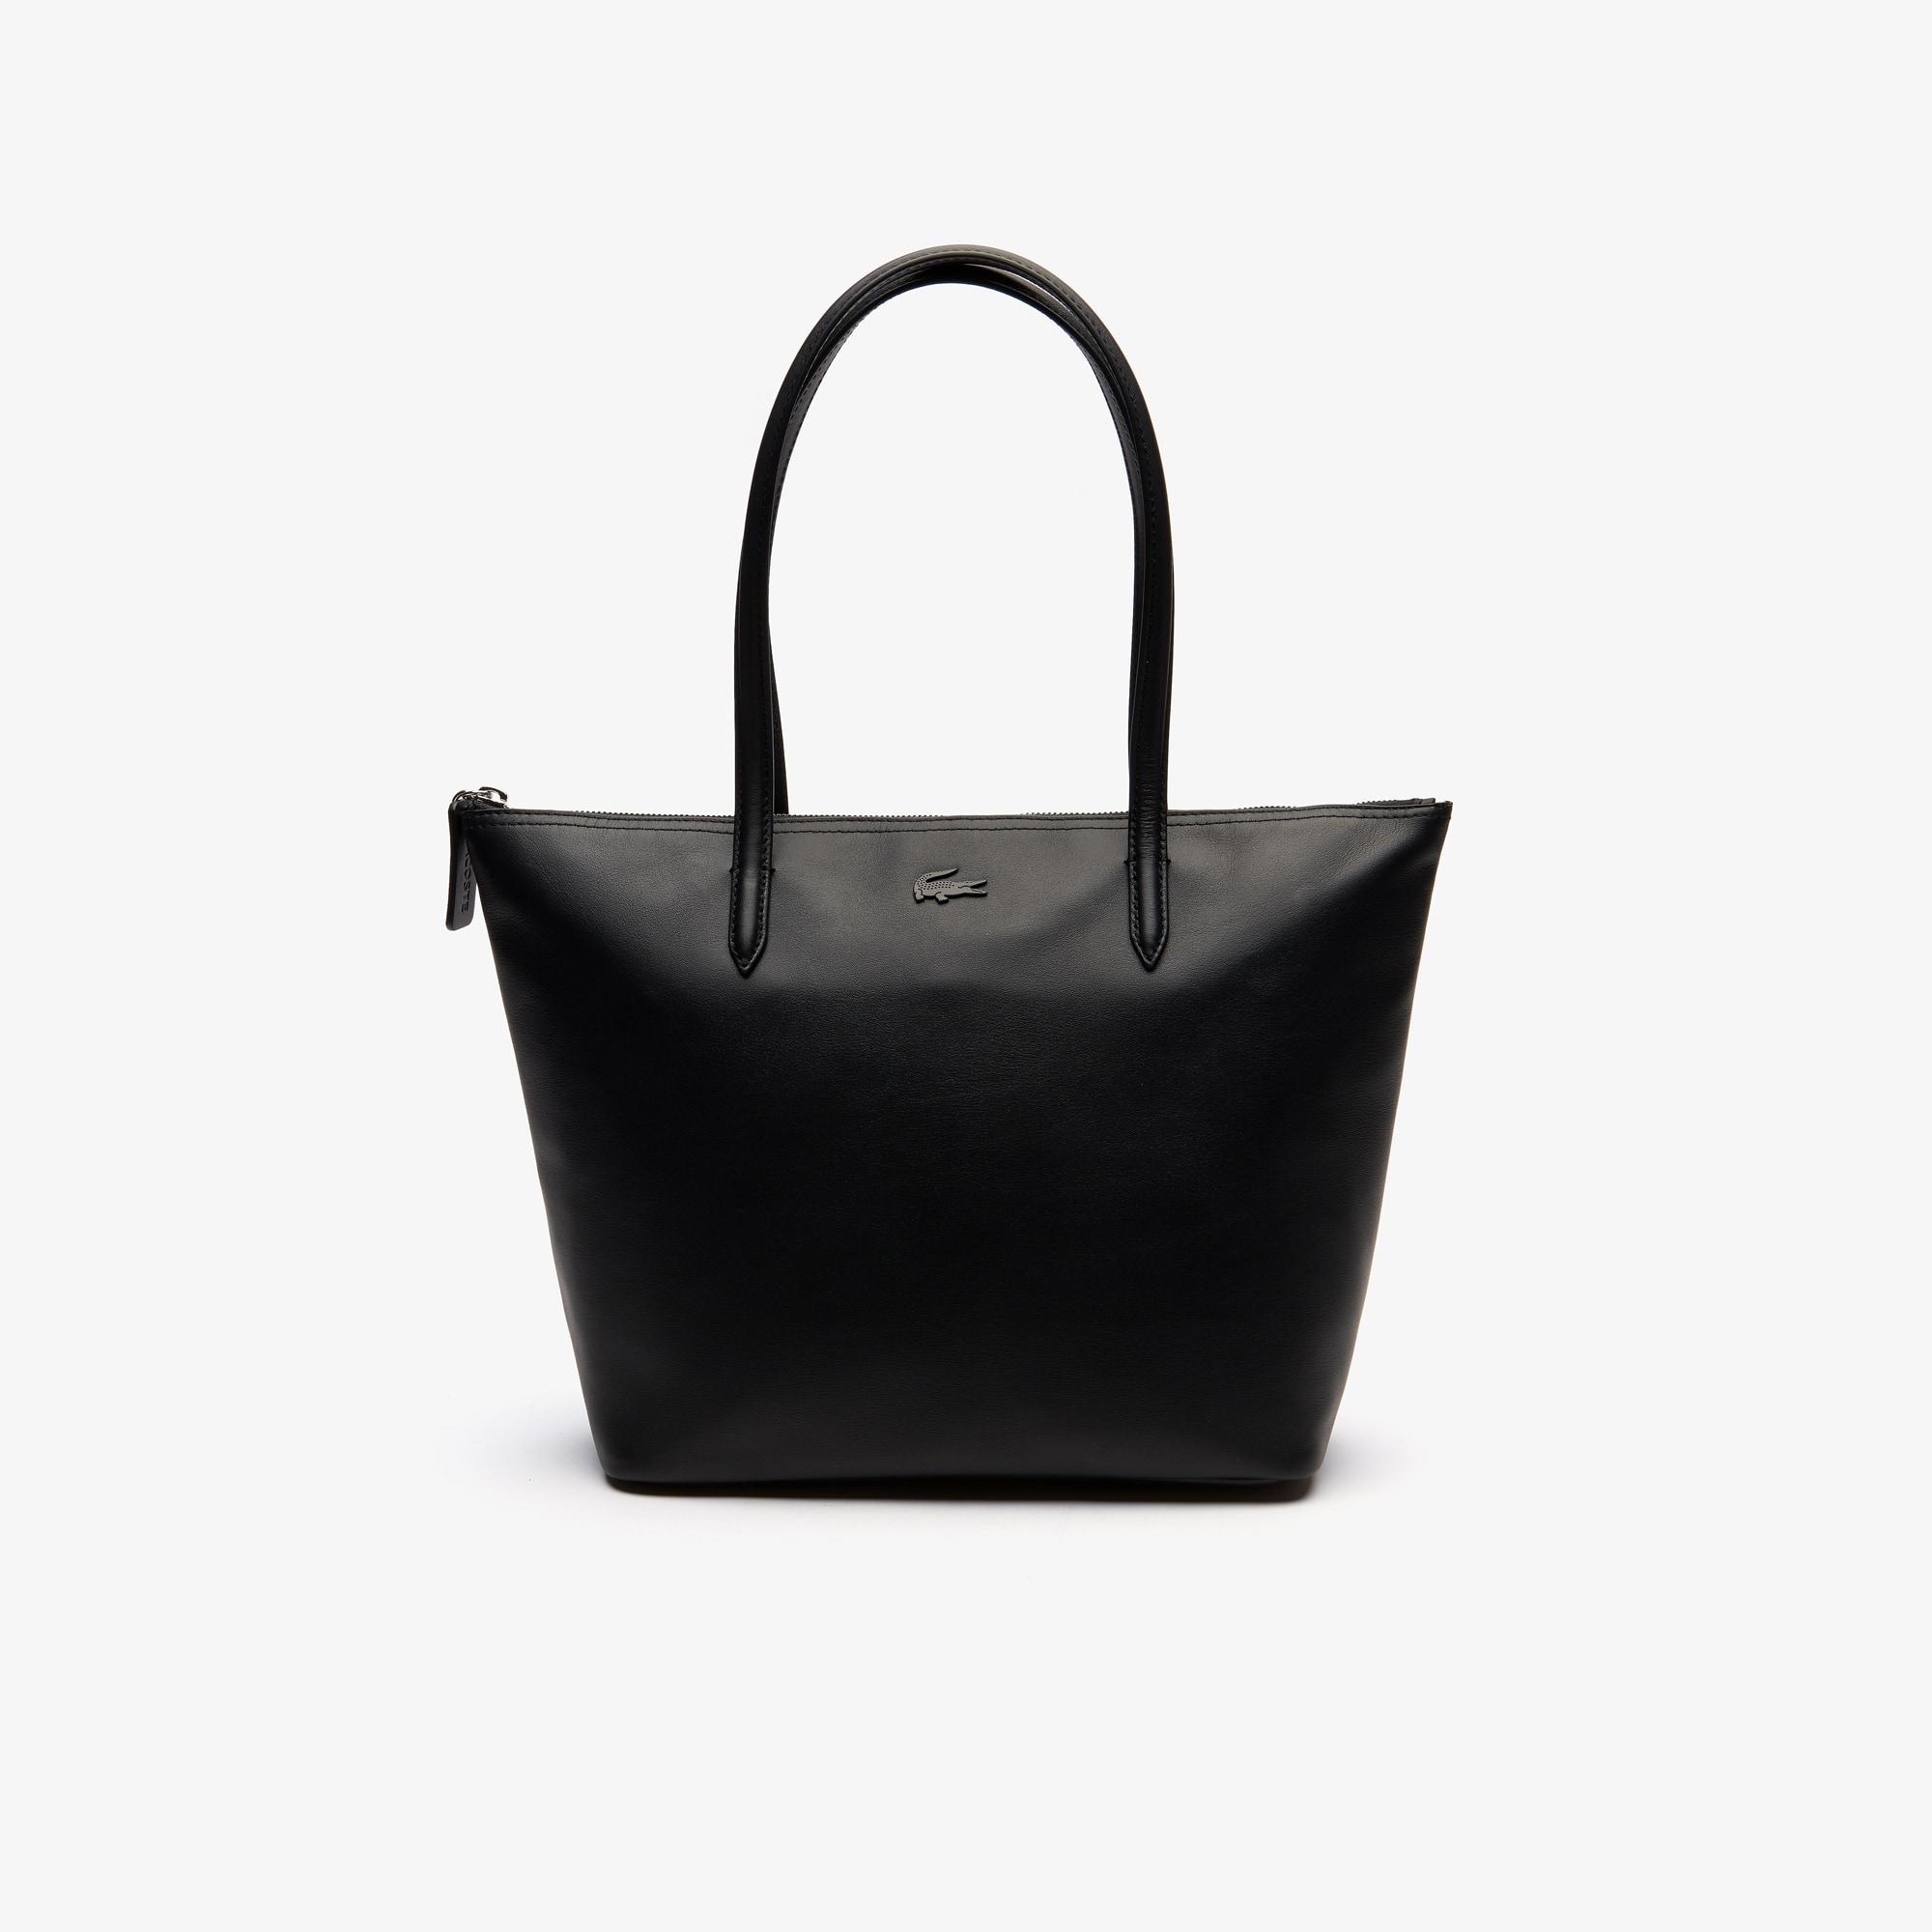 f9532f8de9ee2 Women s L.12.12 Small Leather Tote Bag